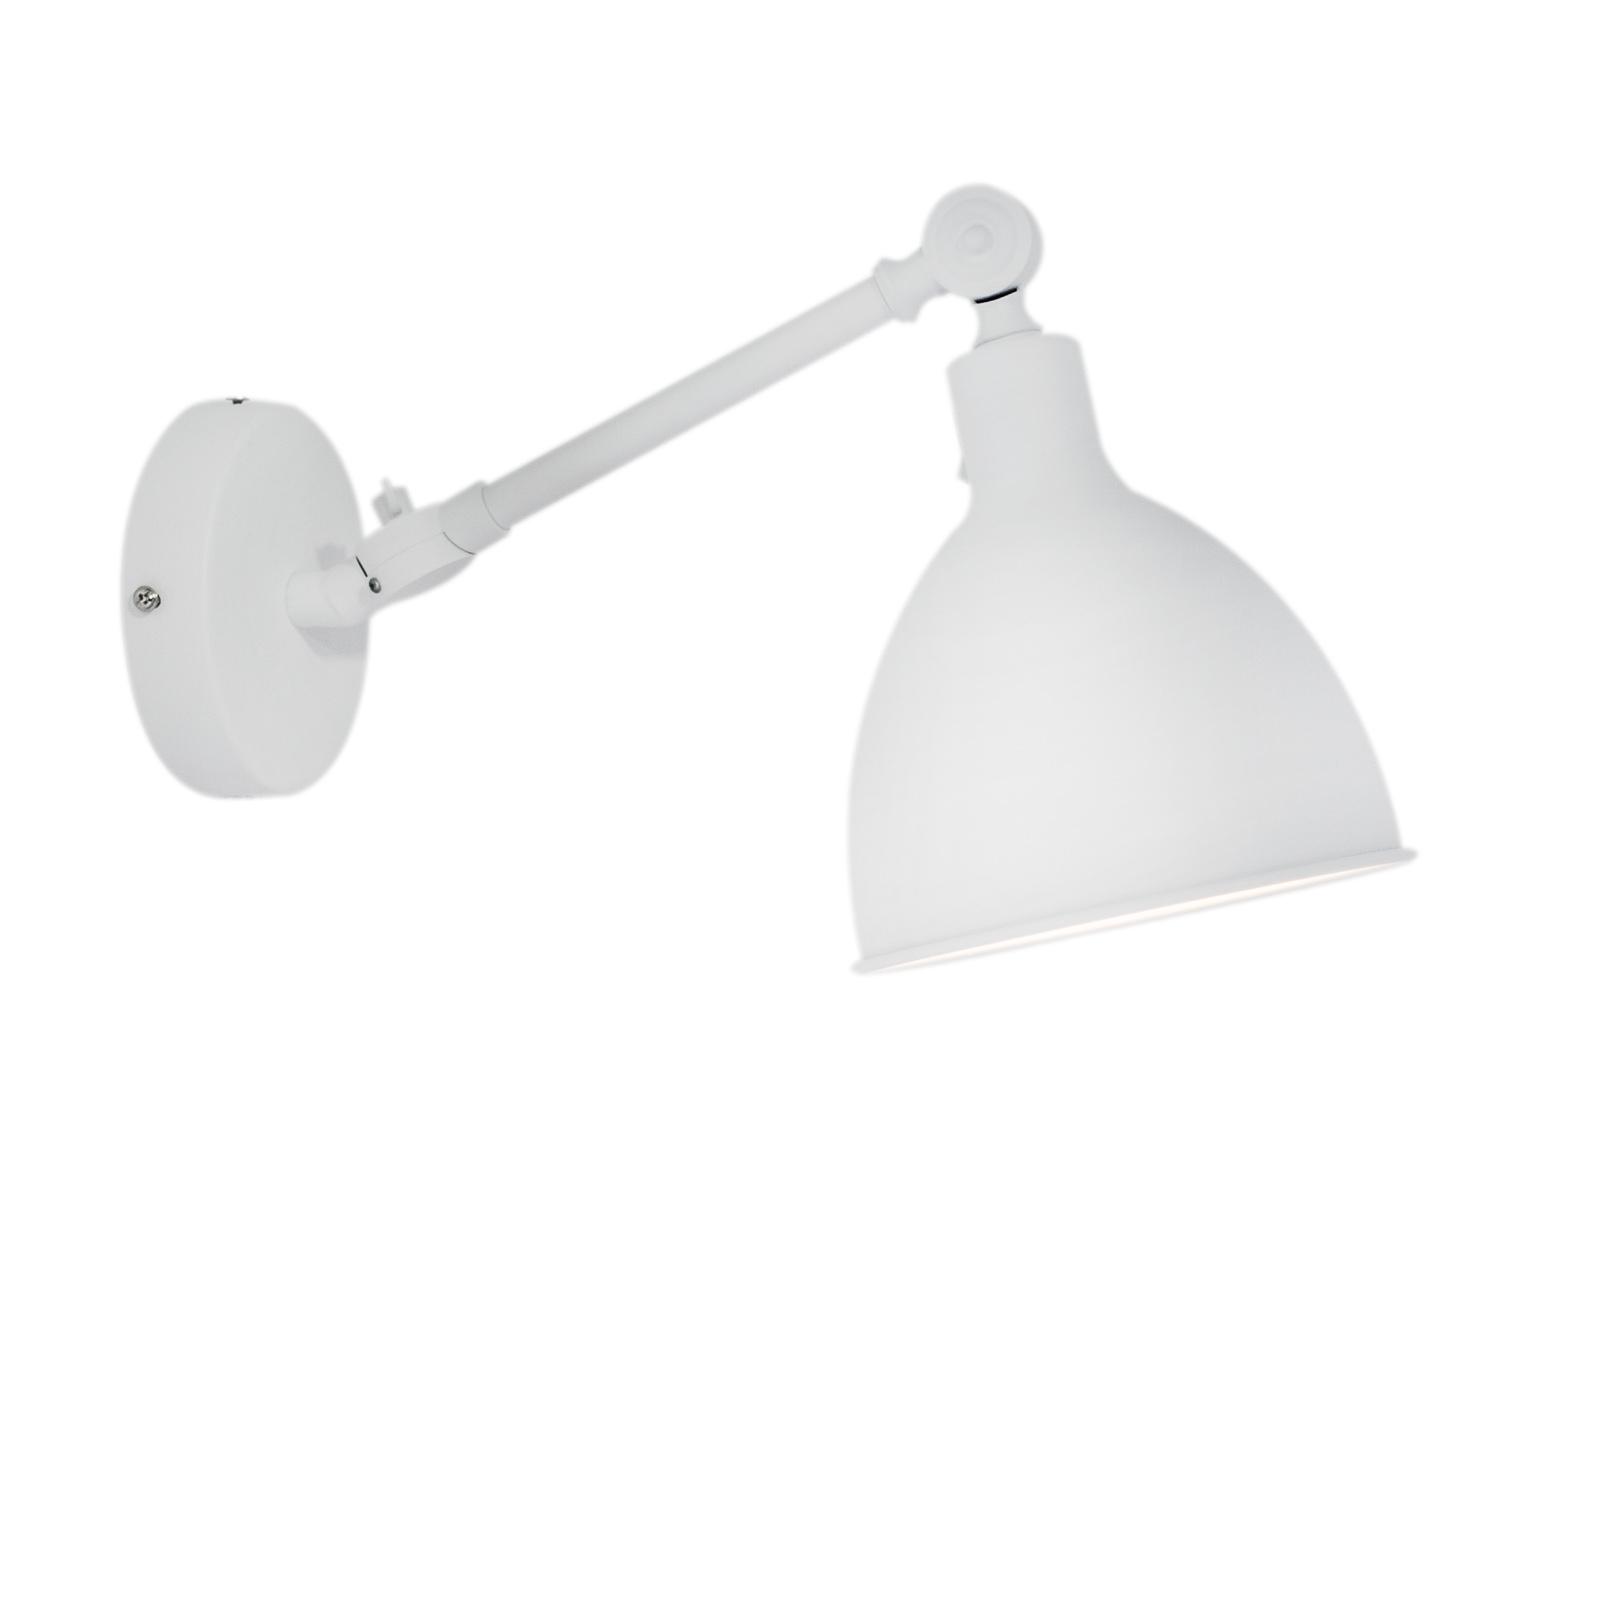 By Rydéns Bazar Mini wandlamp met stekker wit